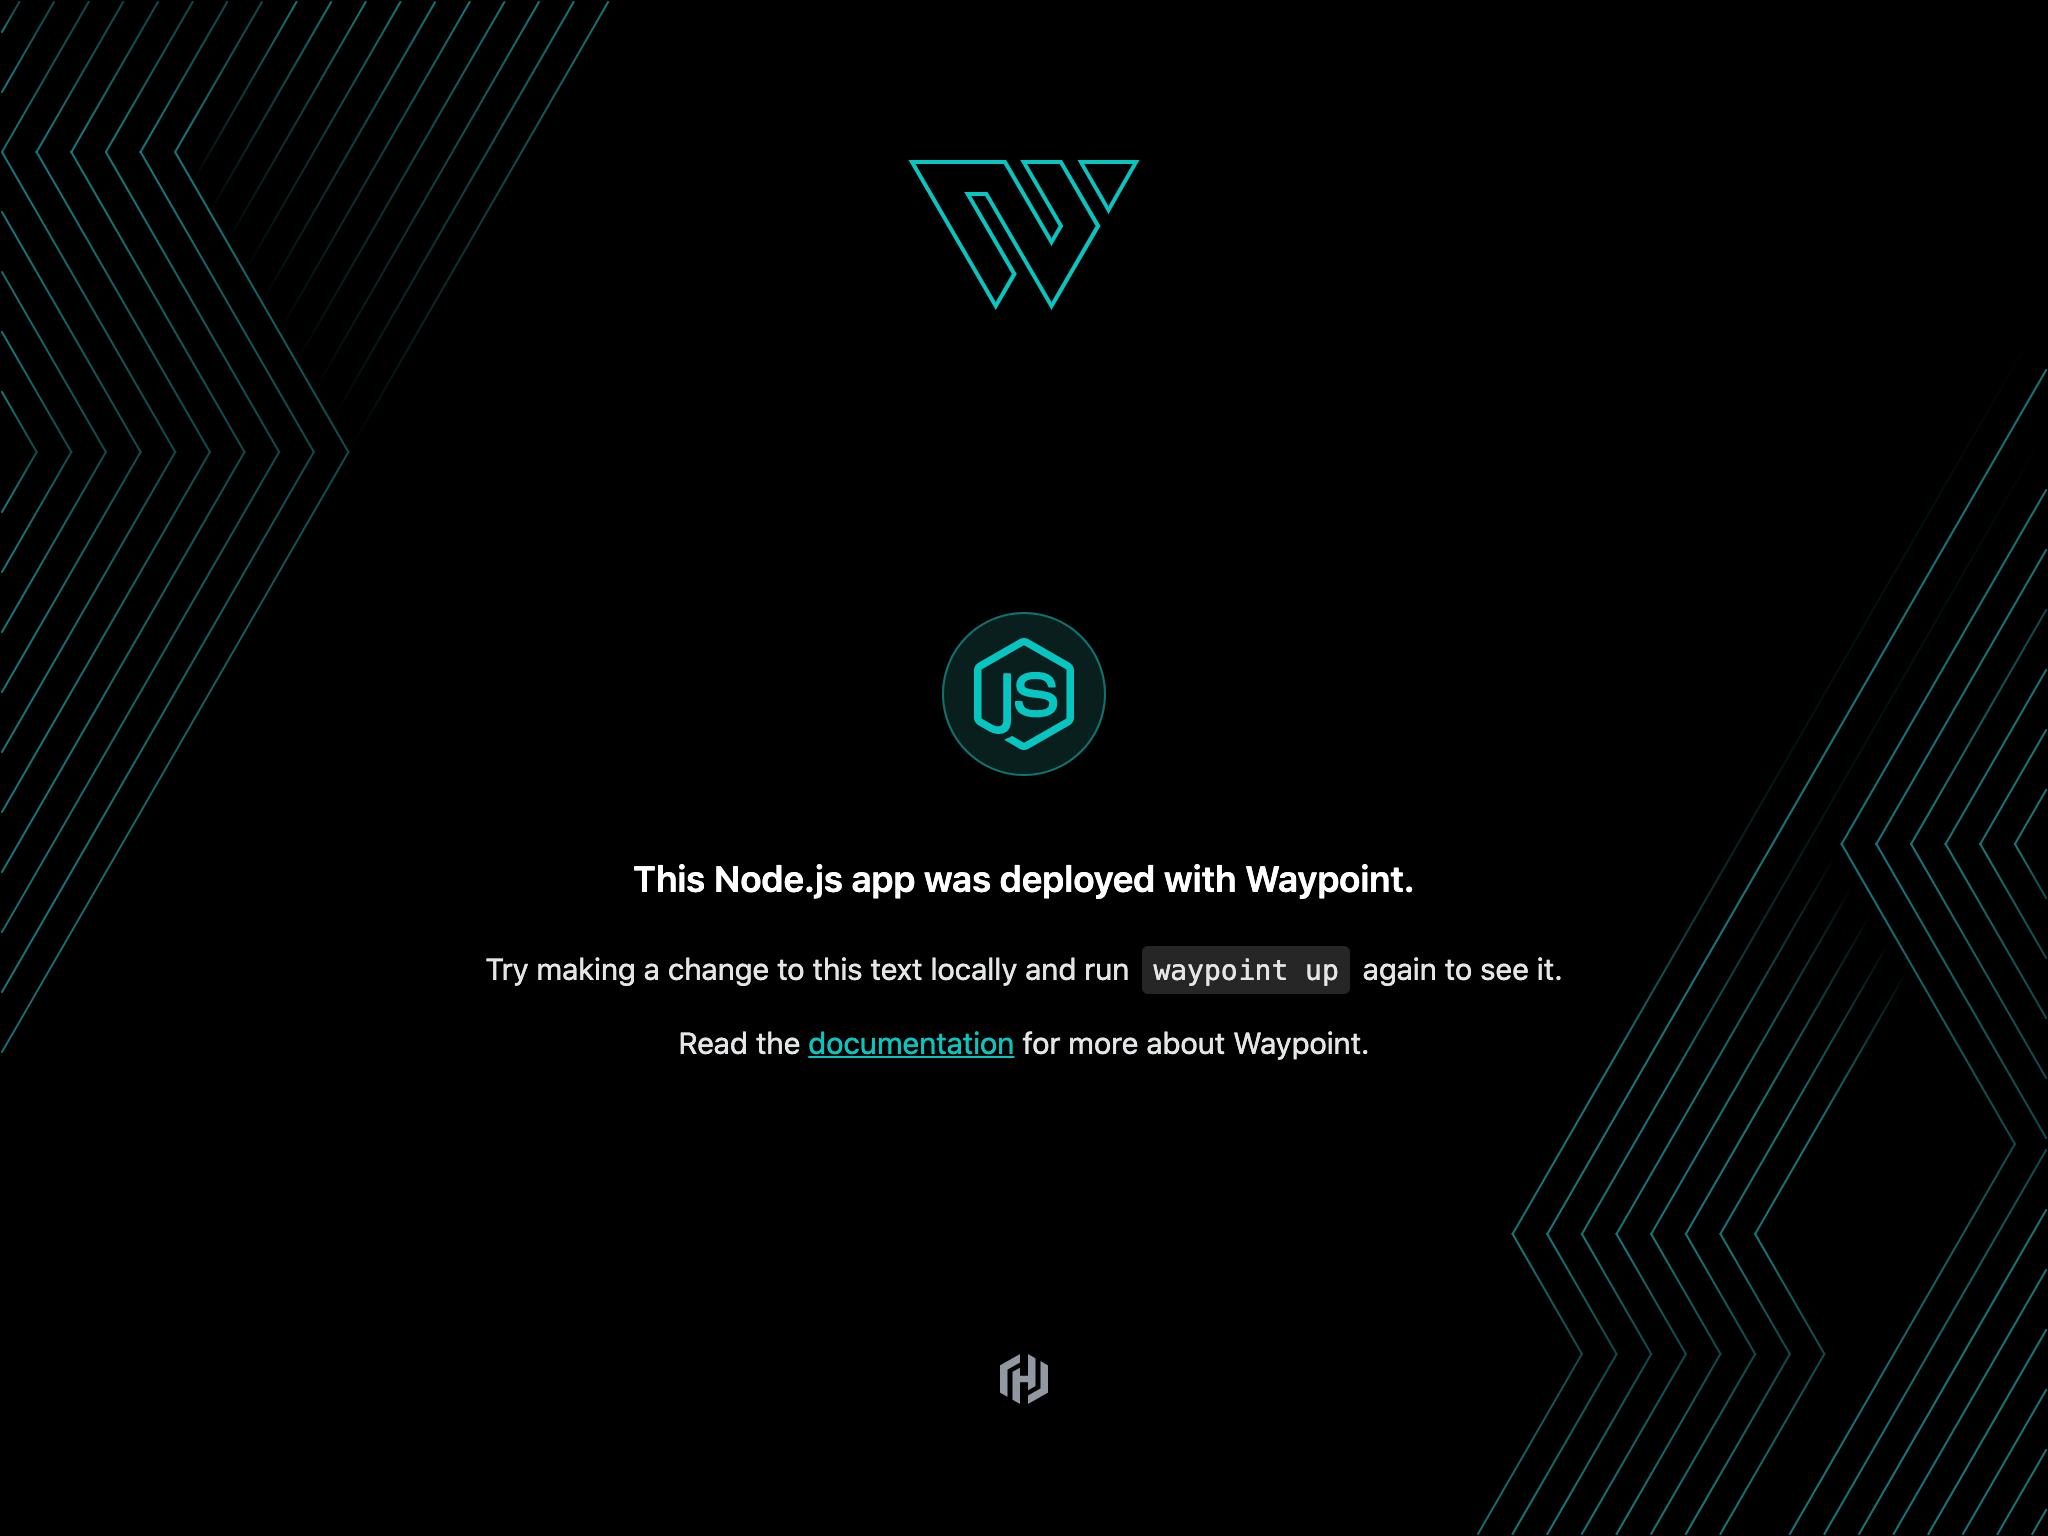 Waypoint Web Application